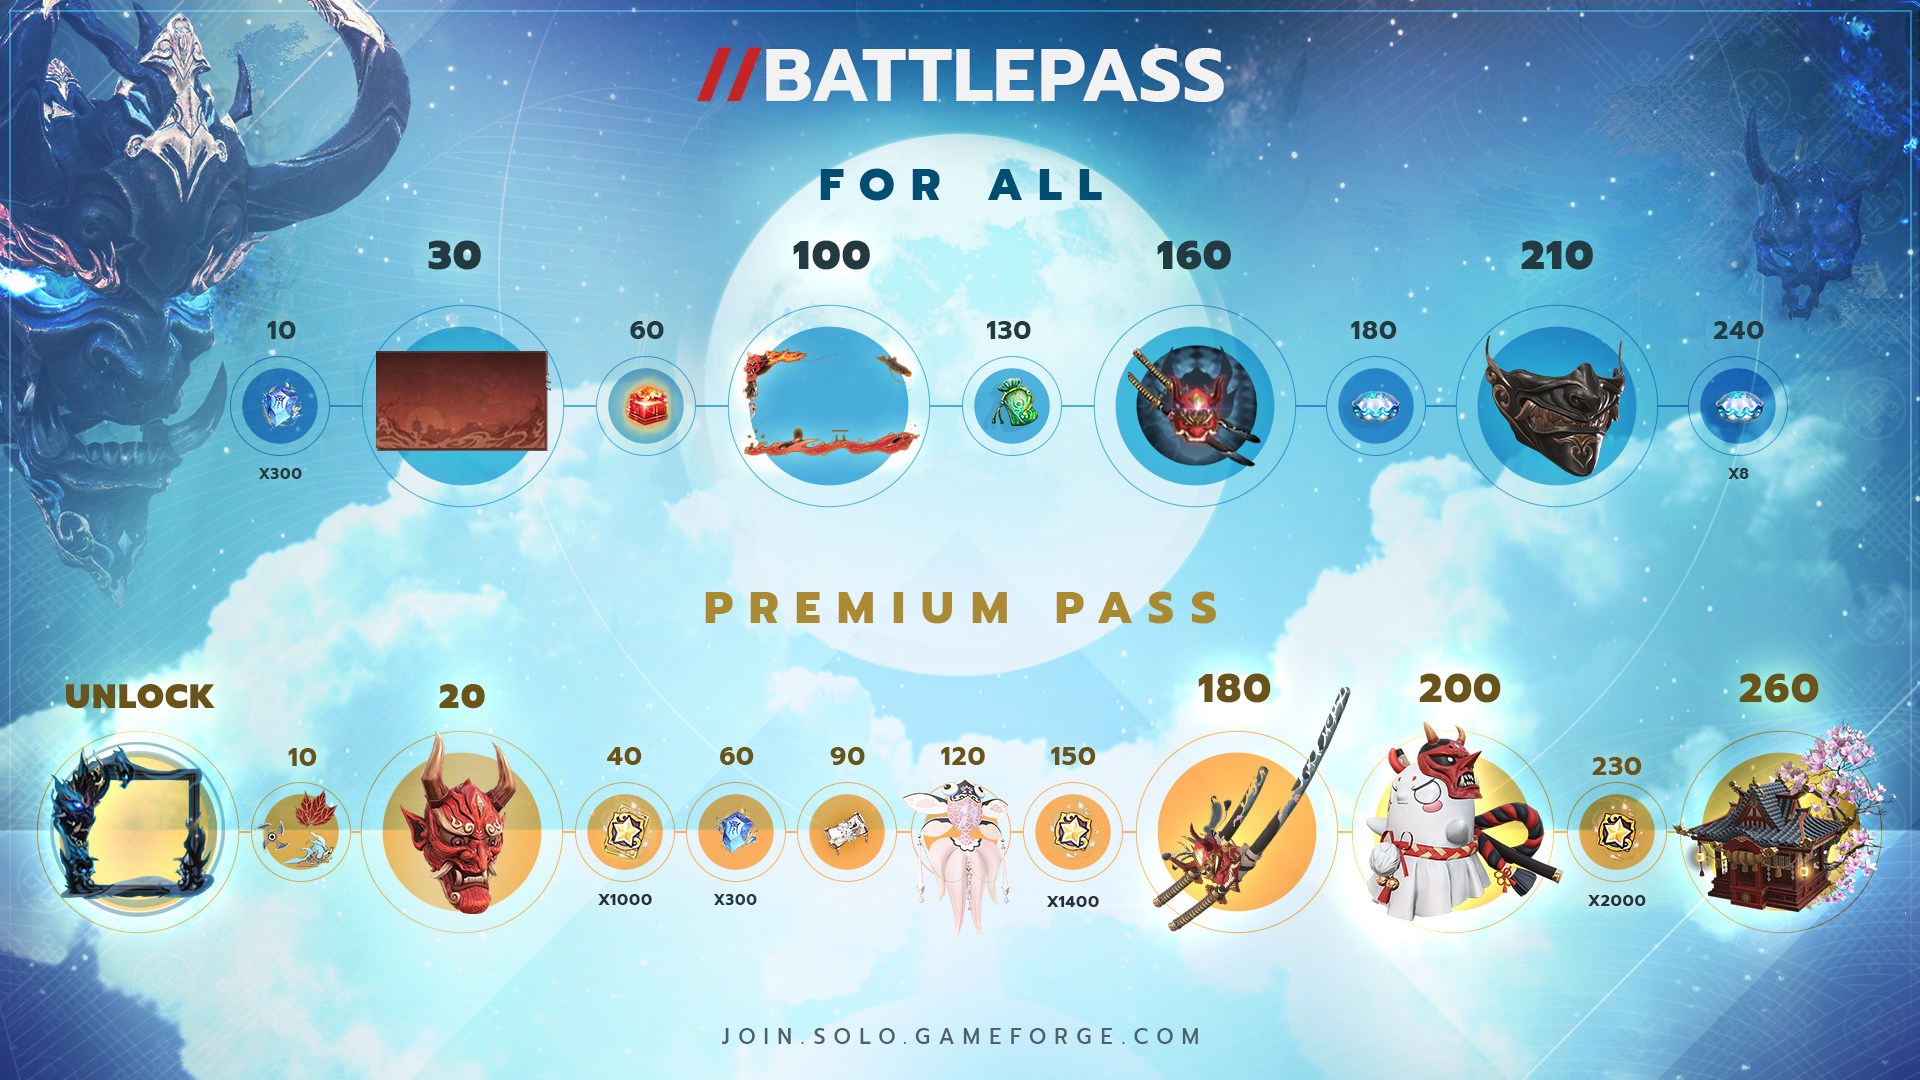 SOLO_Battlepass_S3.jpg